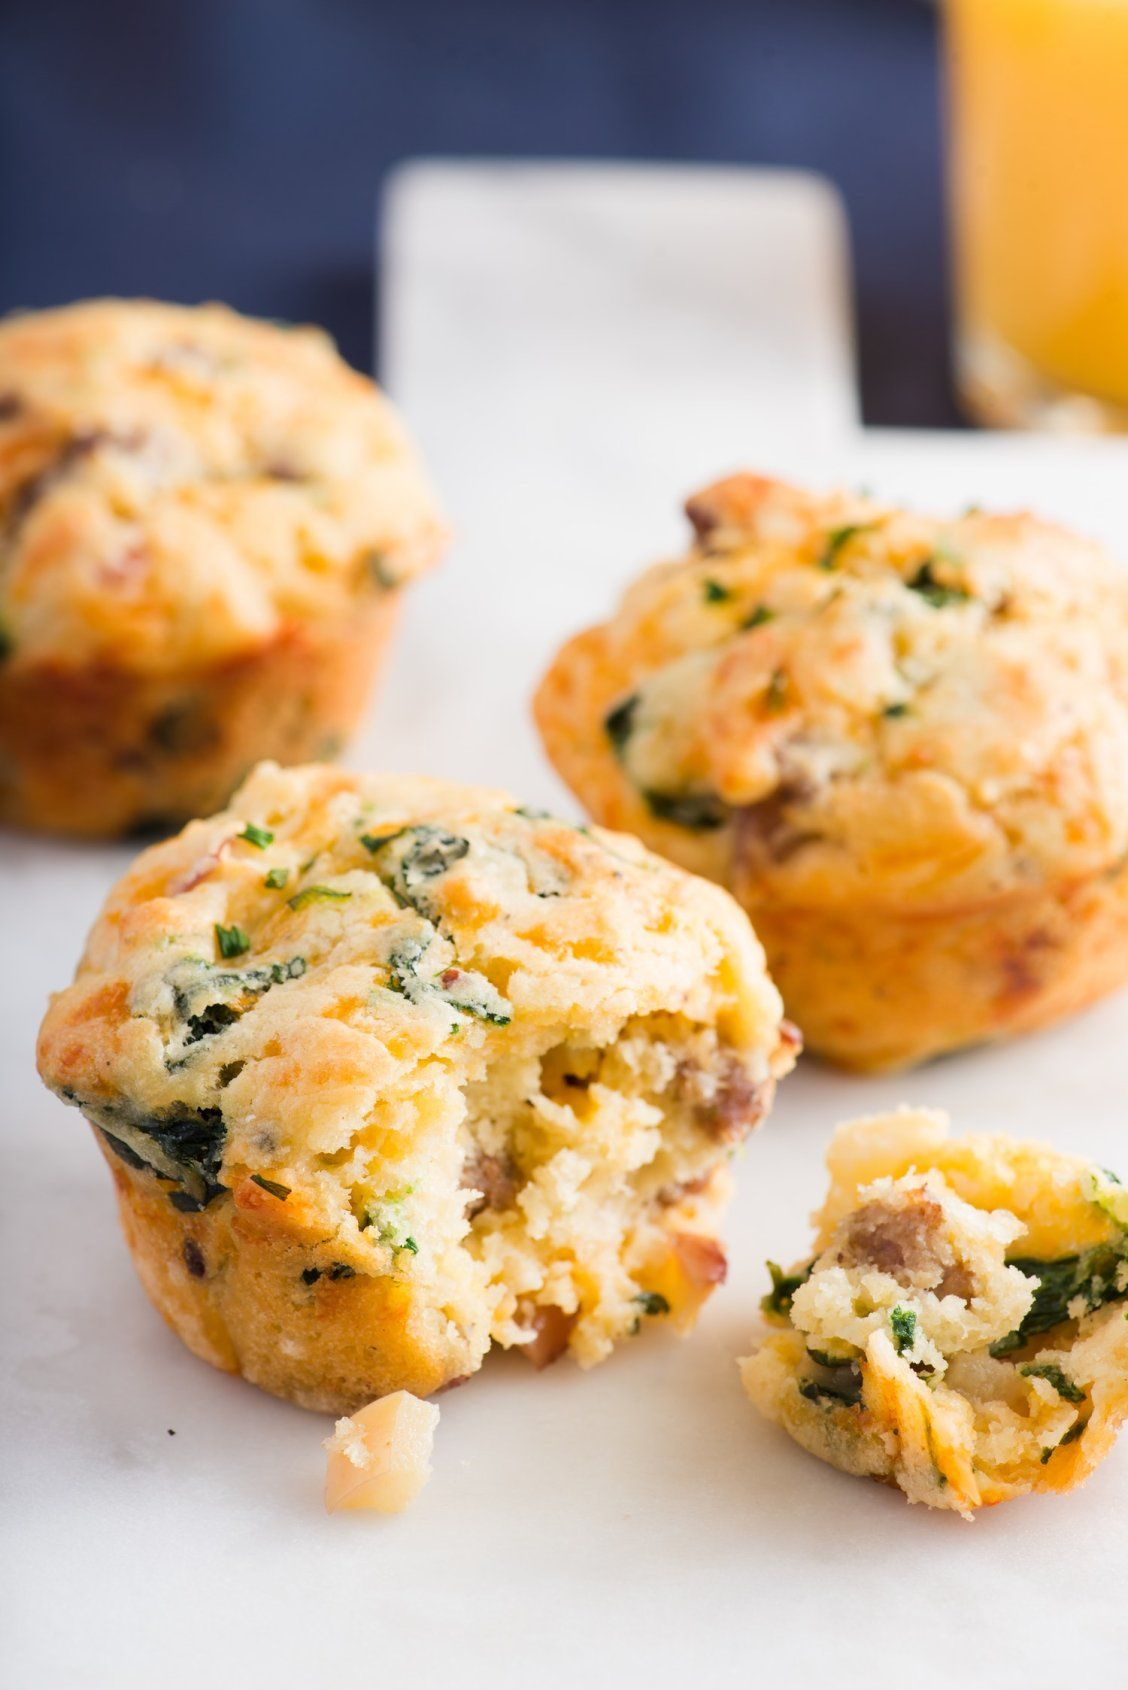 Recipe Loaded Savory Breakfast Muffins Recipe Savory Breakfast Muffins Savory Breakfast High Protein Breakfast Recipes